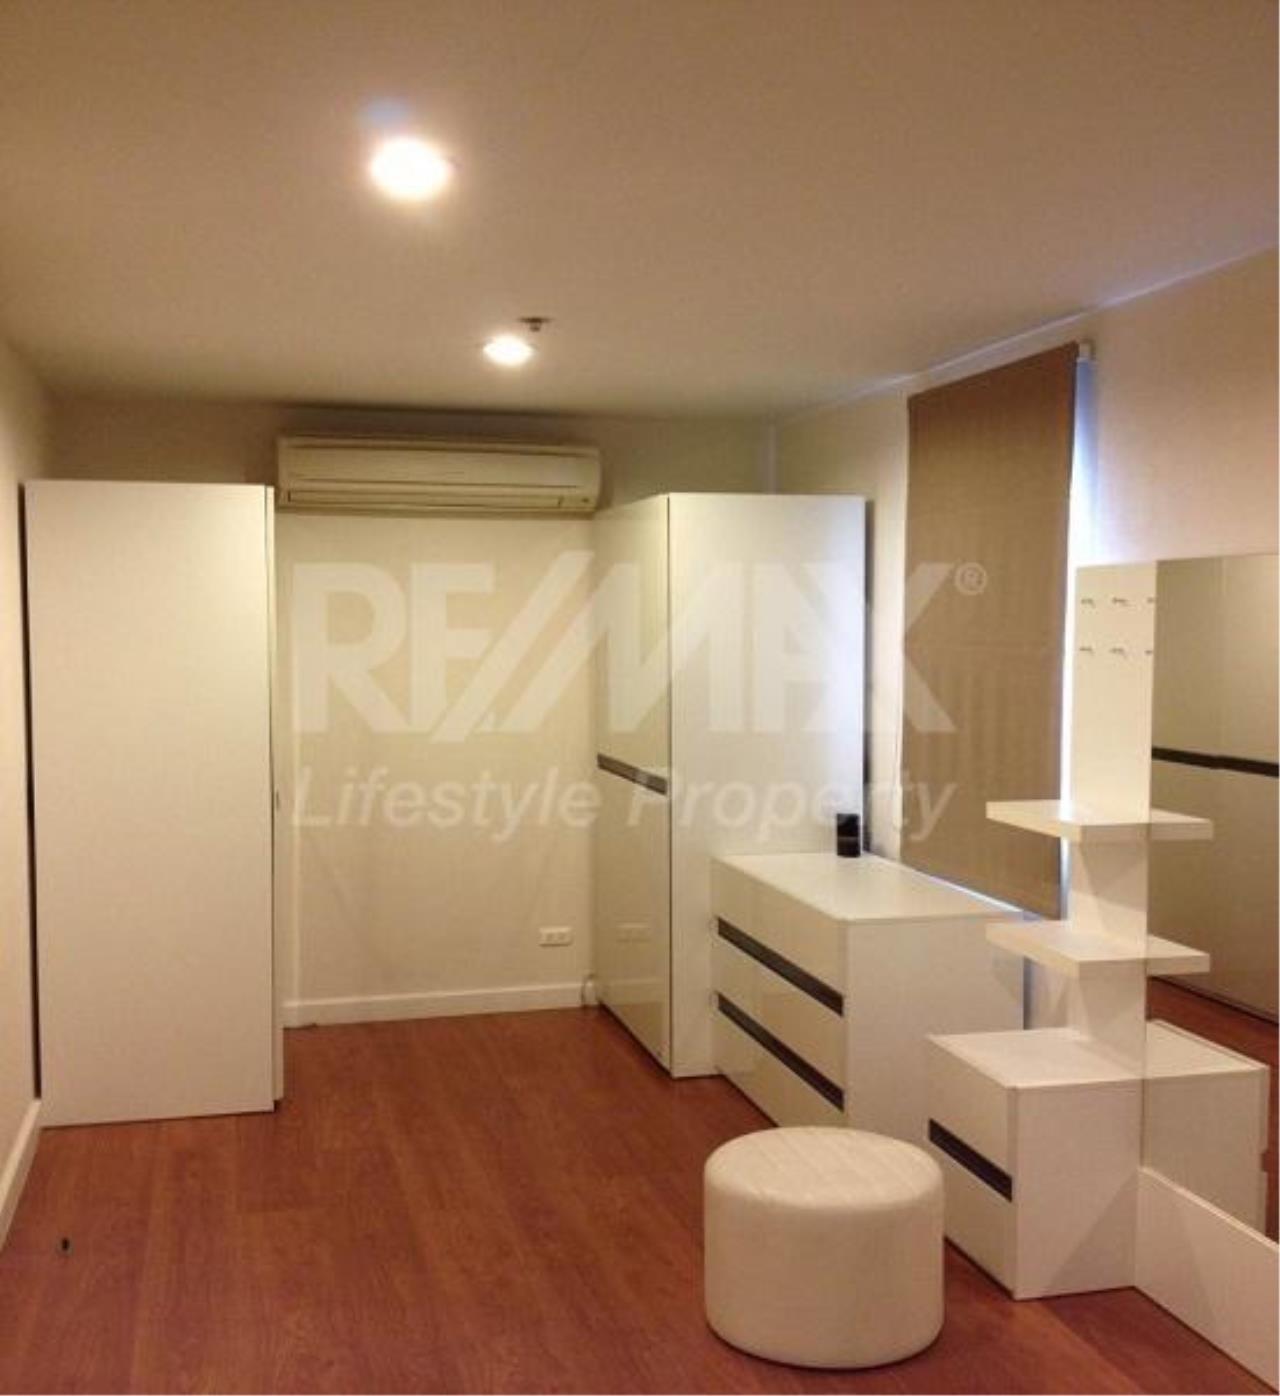 RE/MAX LifeStyle Property Agency's Condo One X Sukhumvit 26 4